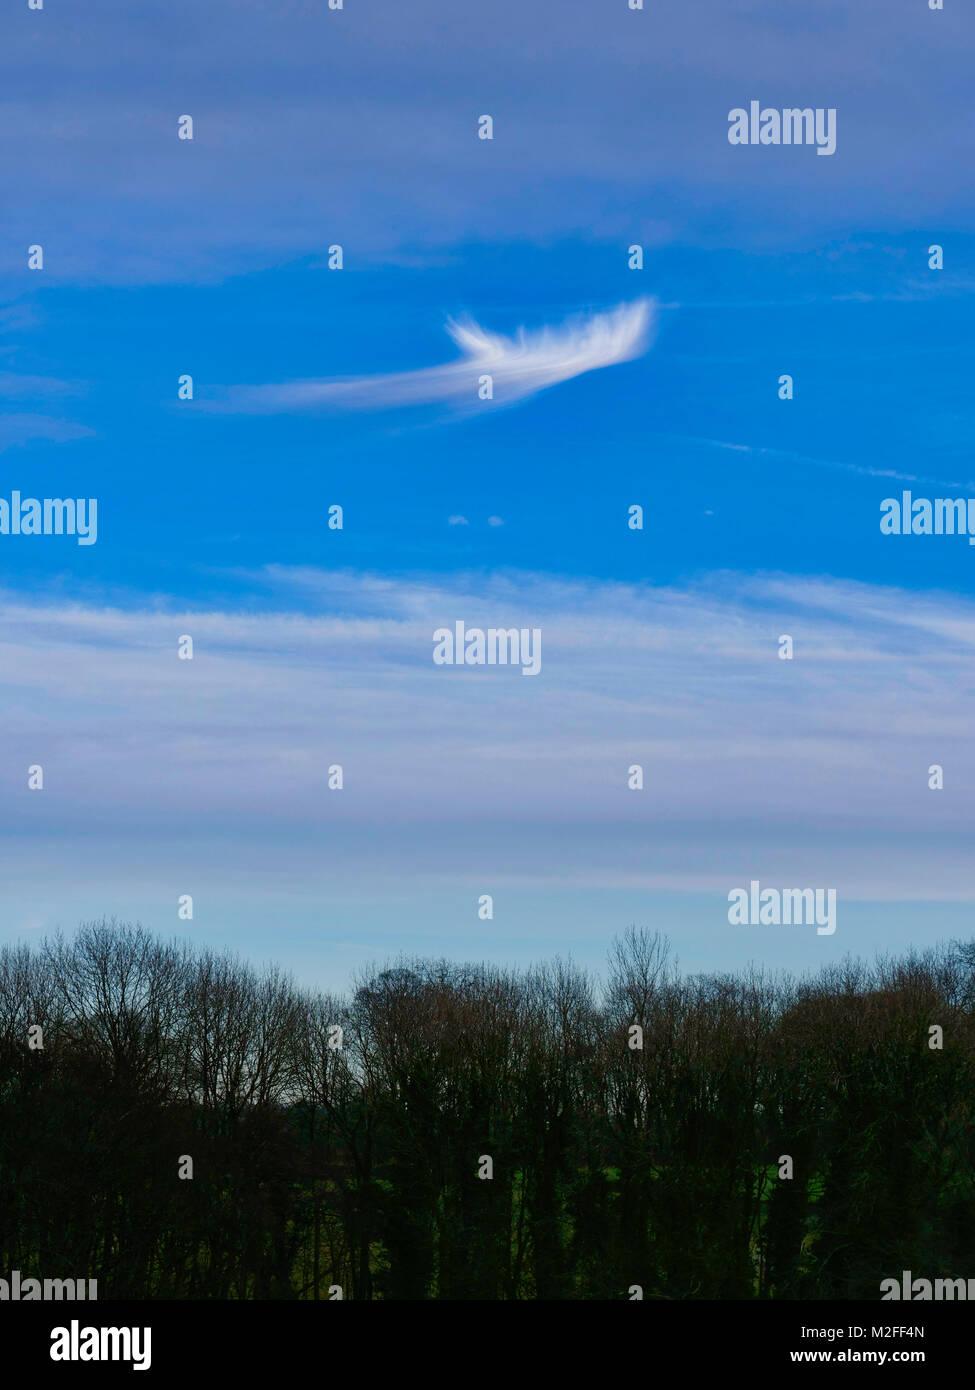 Tissington Village, Derbyshire. 7th Feb, 2018. UK Weather: Unusual strange bizarre looking whispery cloud formation Stock Photo